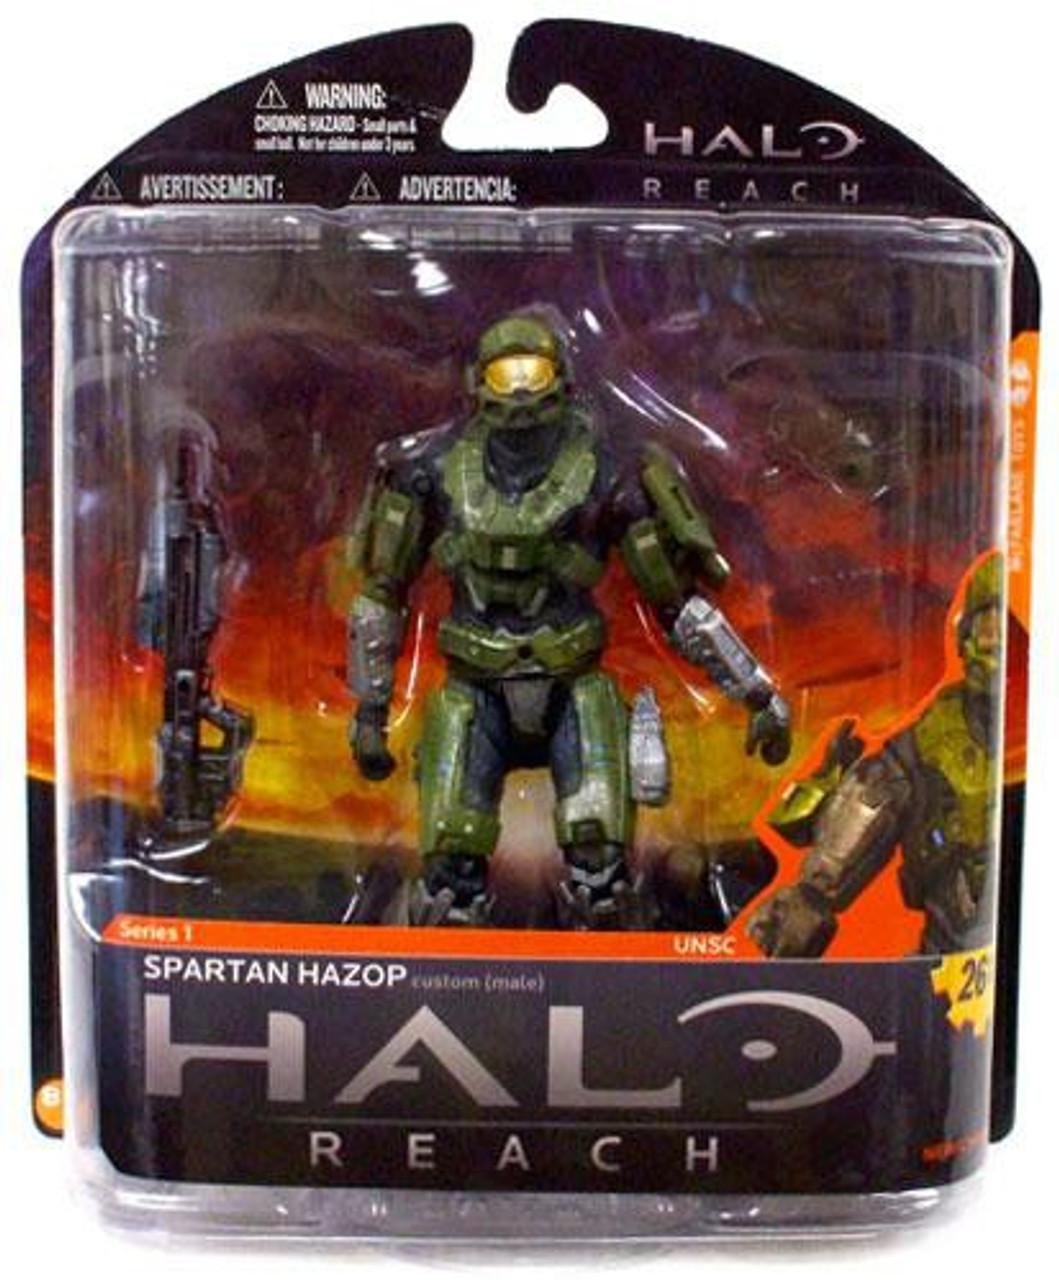 McFarlane Toys Halo Reach Series 1 Spartan Hazop Action Figure